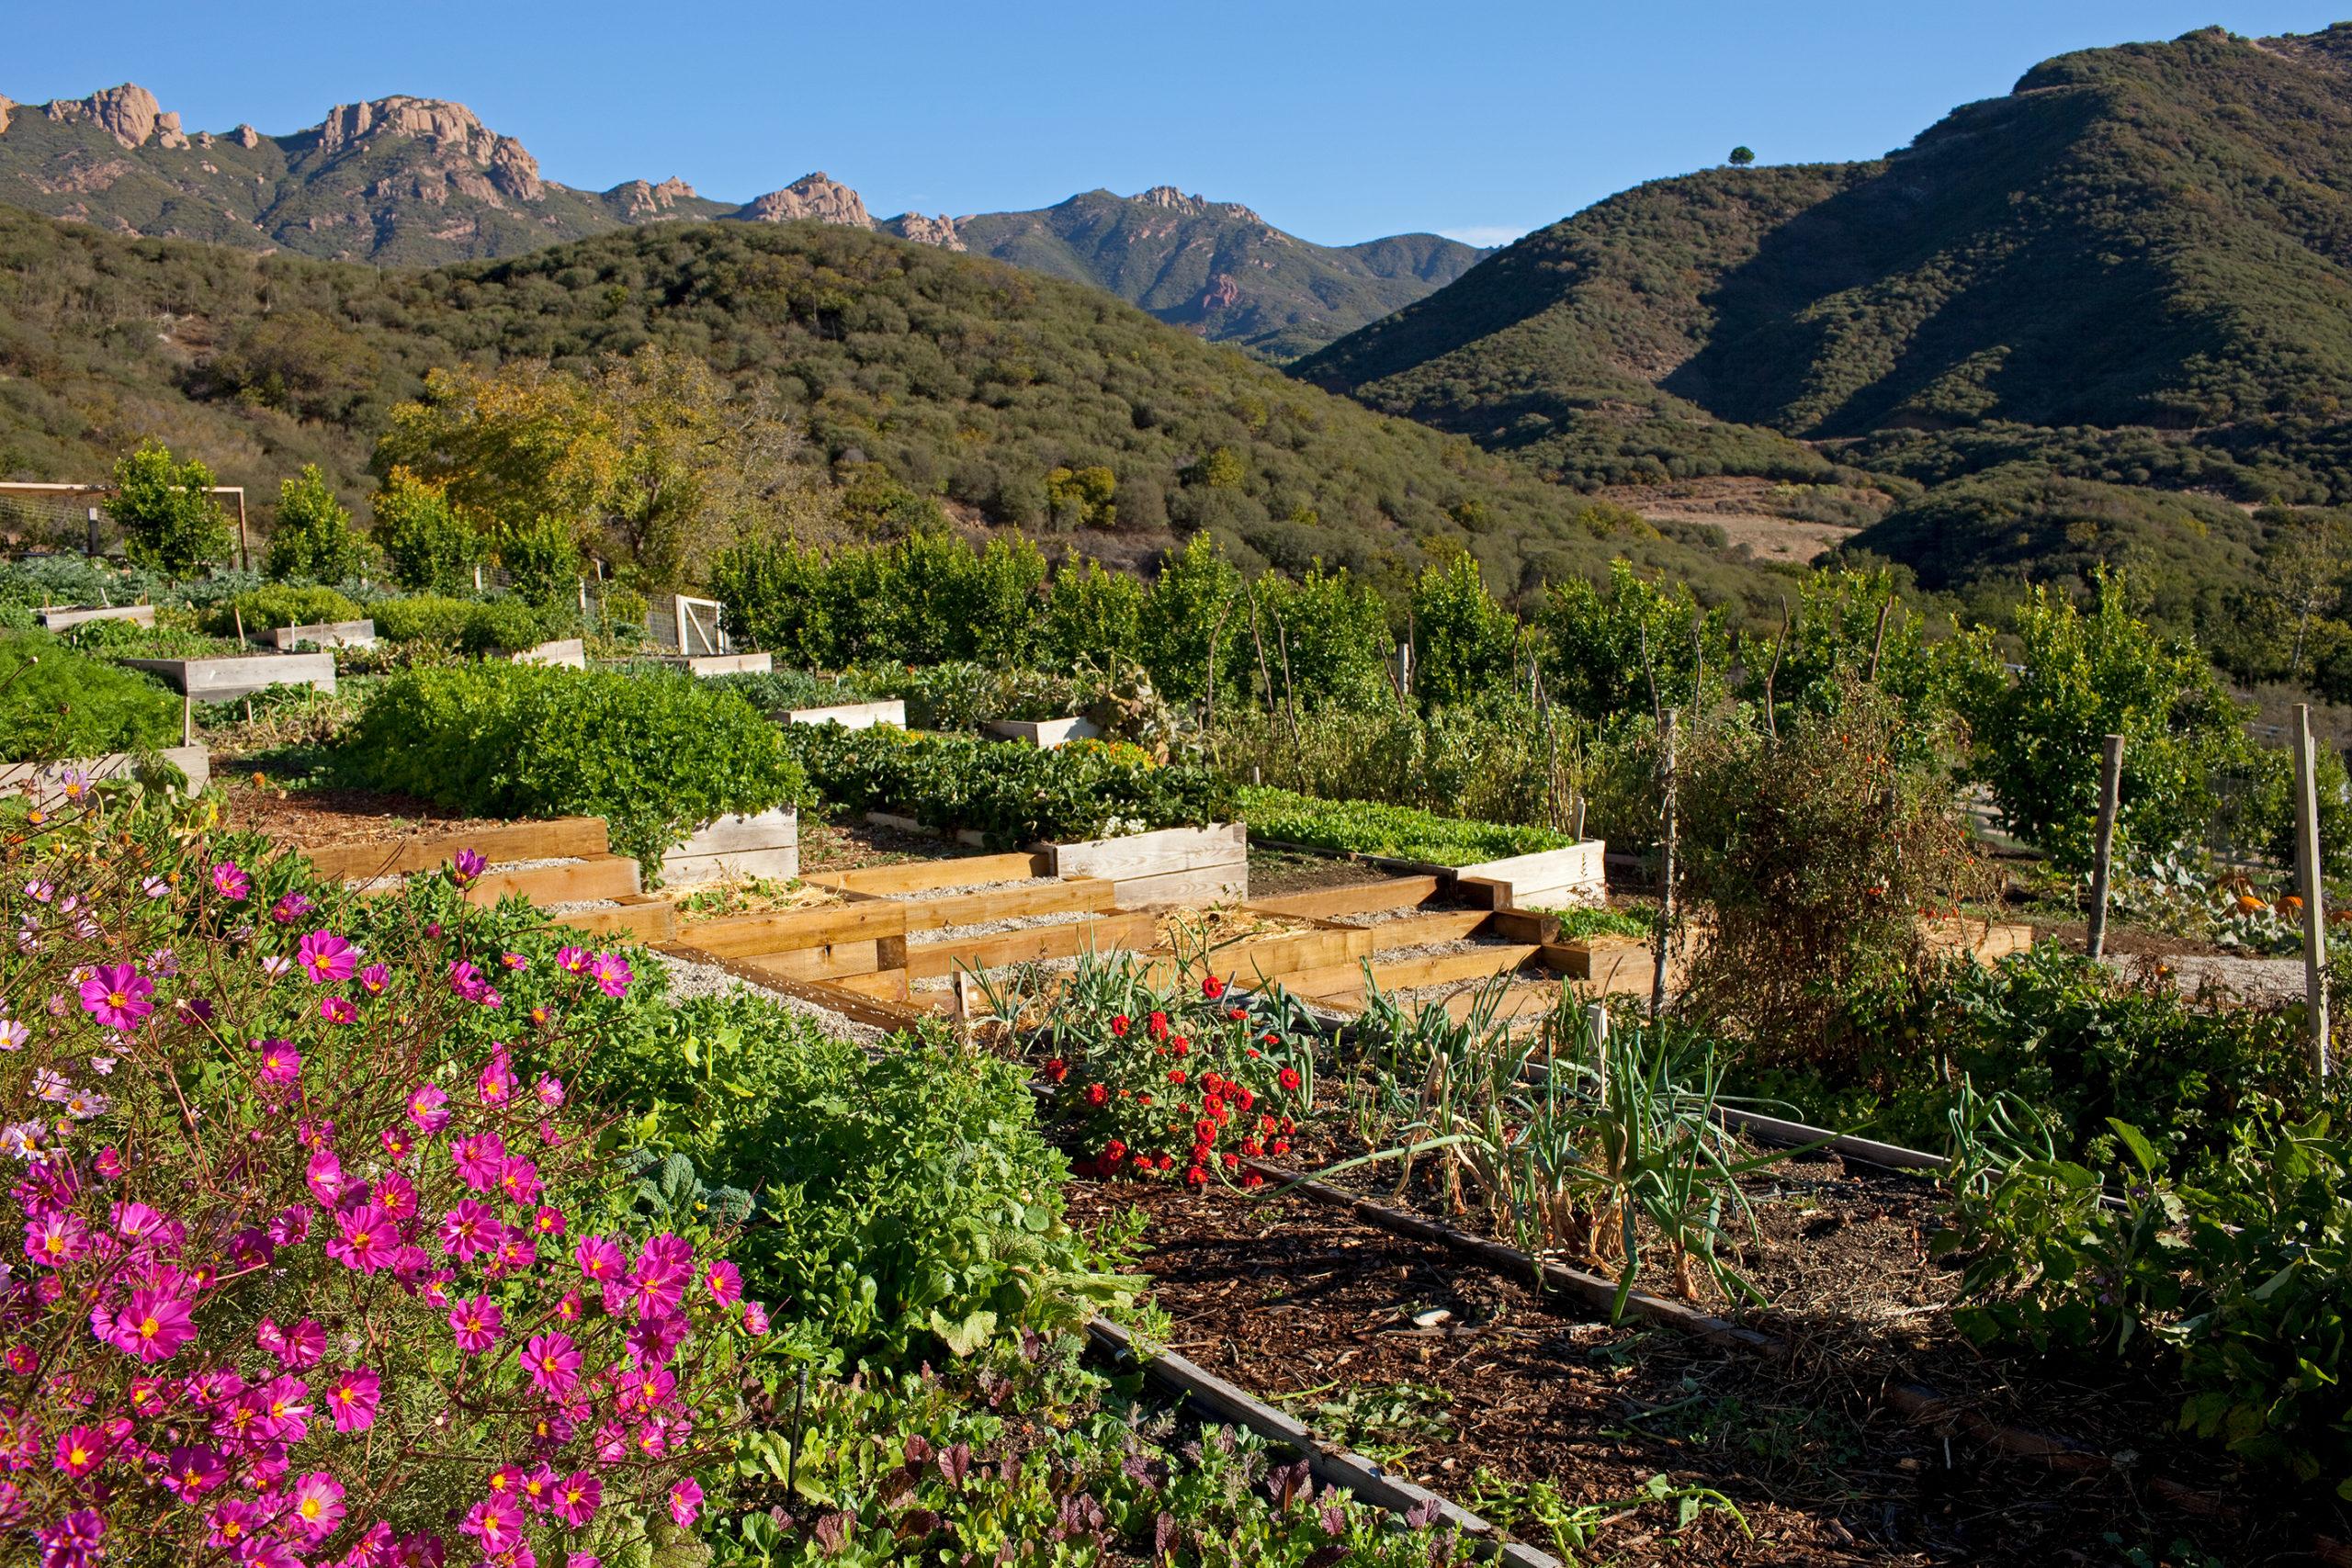 Garden overlooking the Malibu hillside.